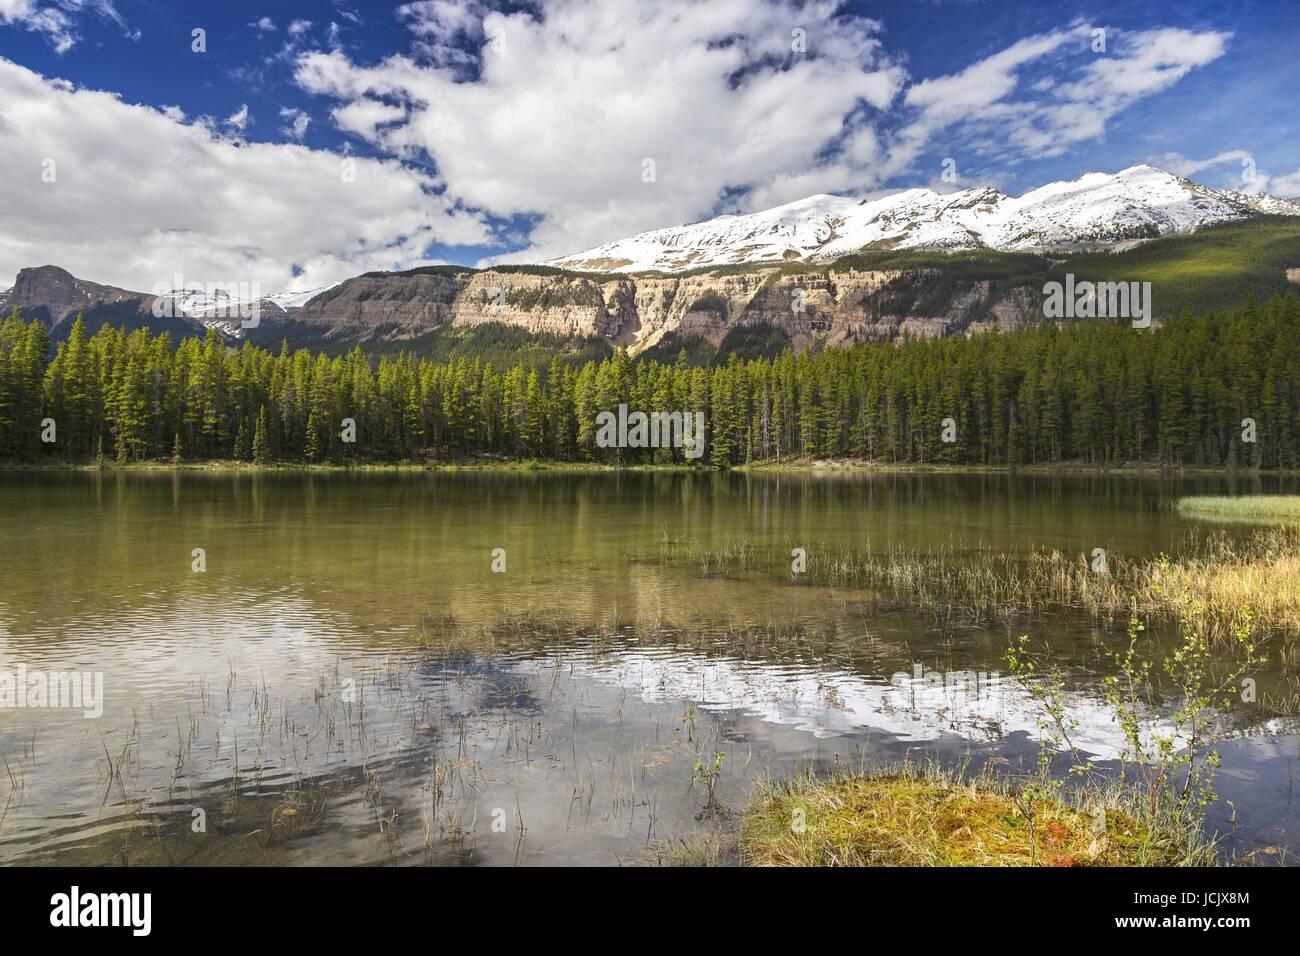 Honeymoon lake jasper national park rocky mountains alberta canada